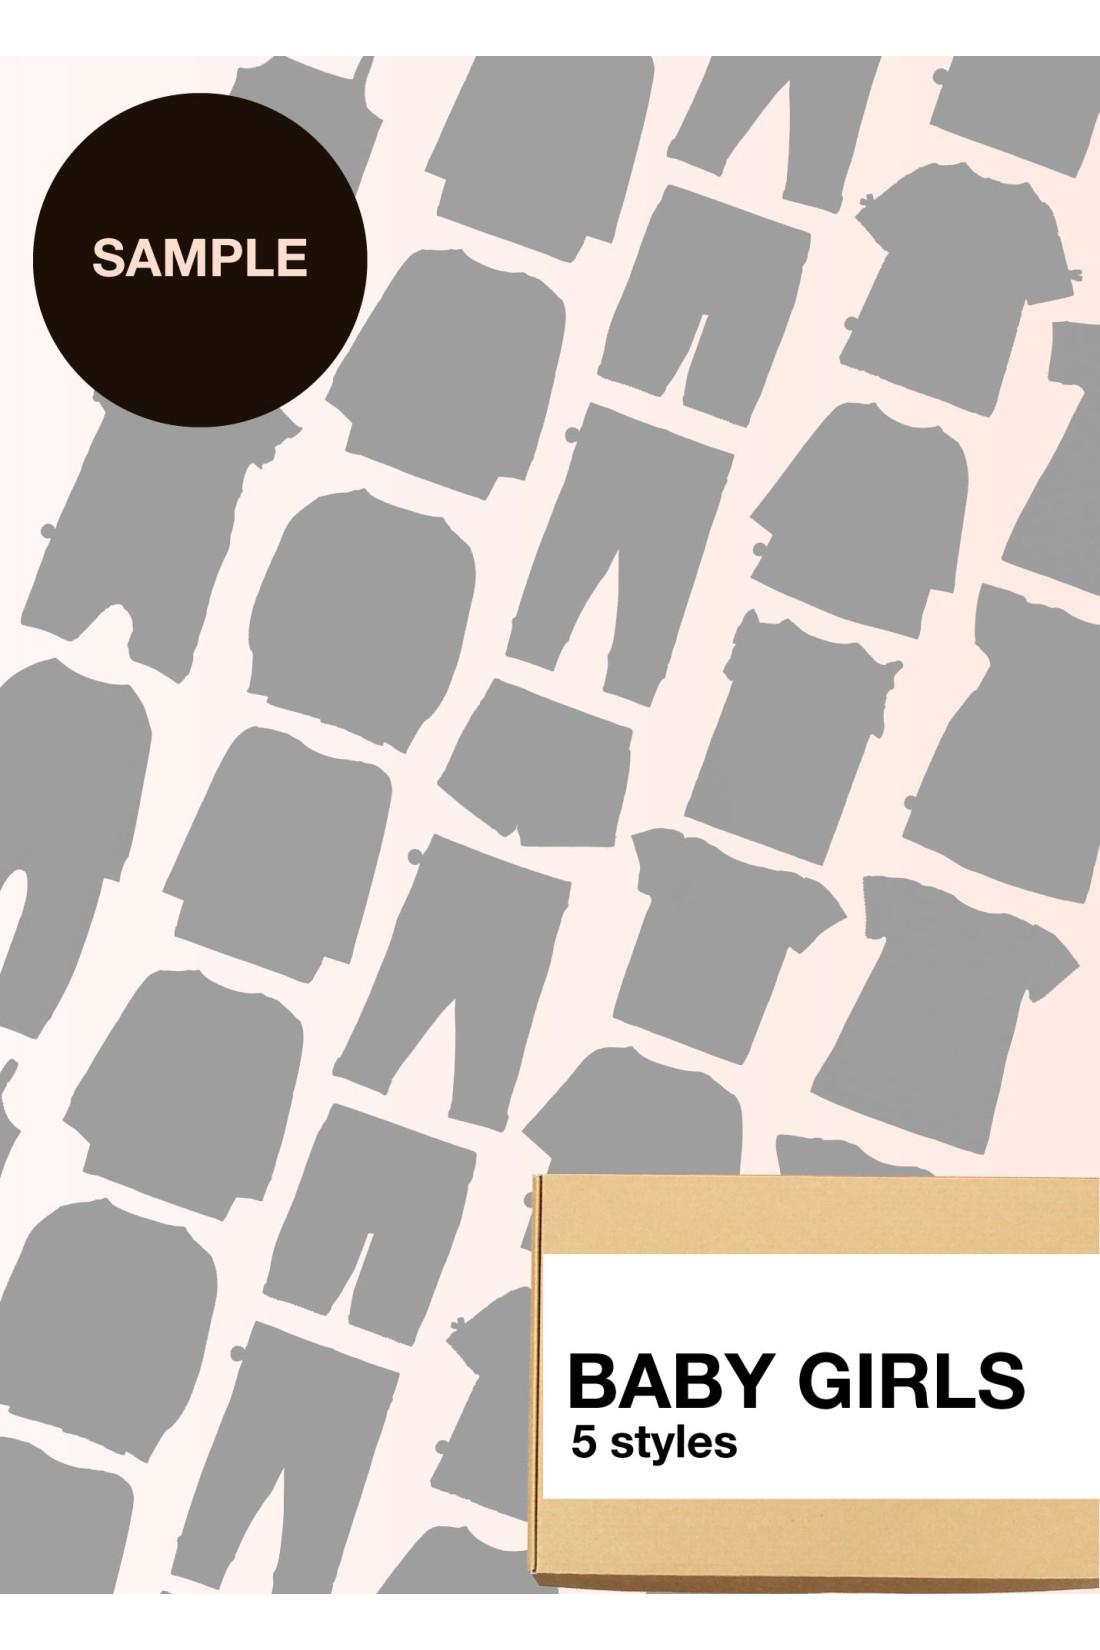 Sample Surprise Box Baby Girl - 5 Styles